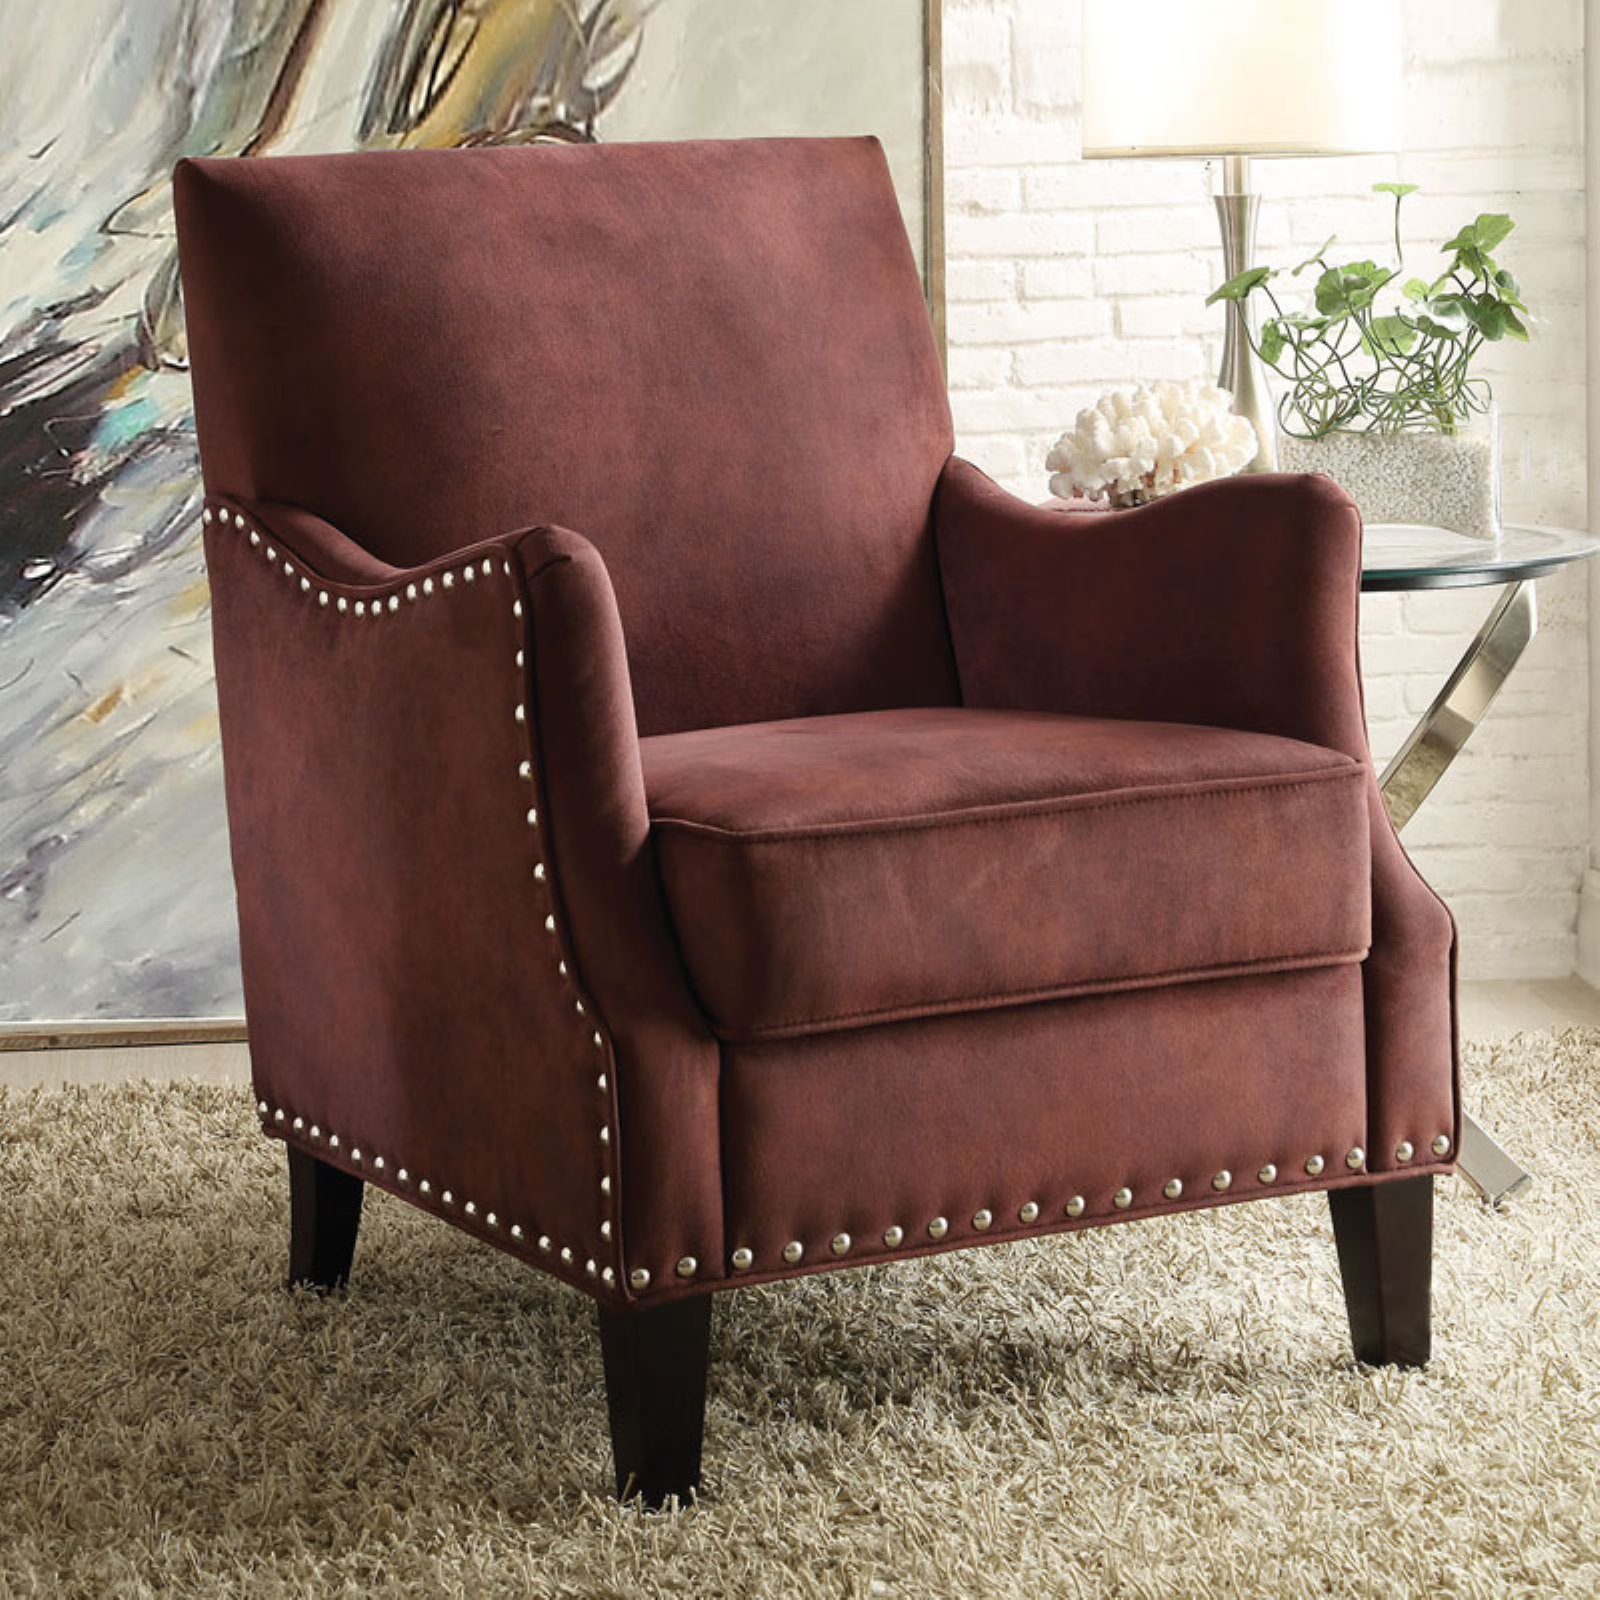 ACME Sinai Naihead Club Chair, Multiple Colors by Acme Furniture